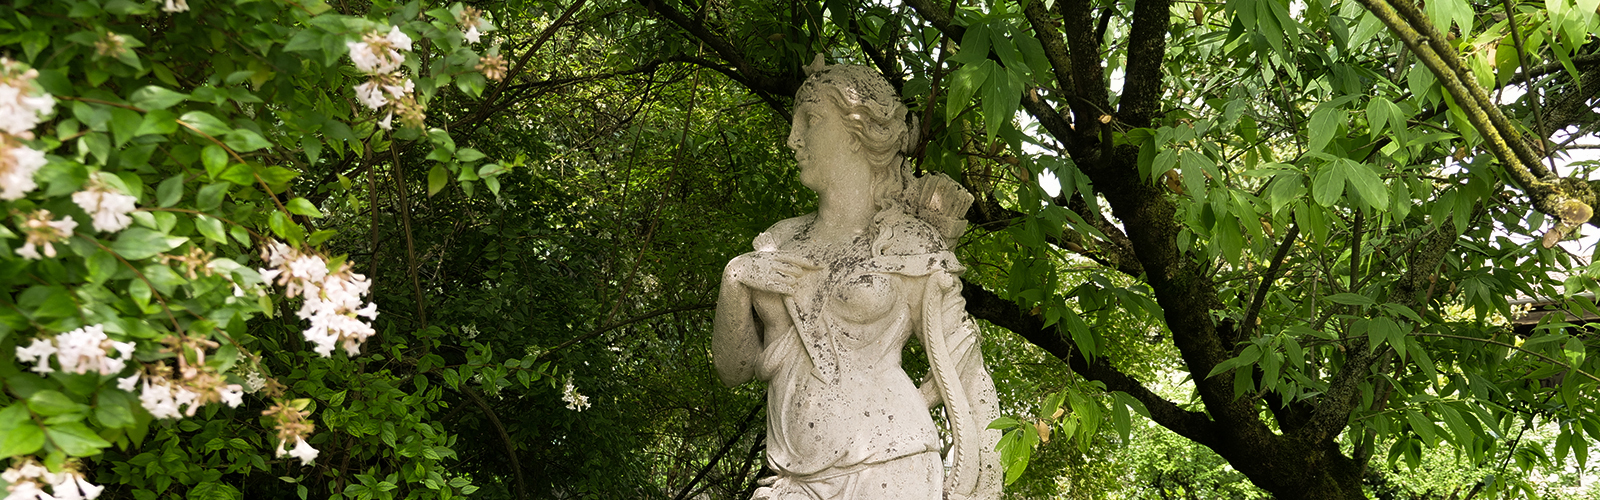 giardino con statua, villa con giardino, villa Vicenza con giardino, villa con giardino Vicenza, villa con giardino Grumolo delle Abbadesse